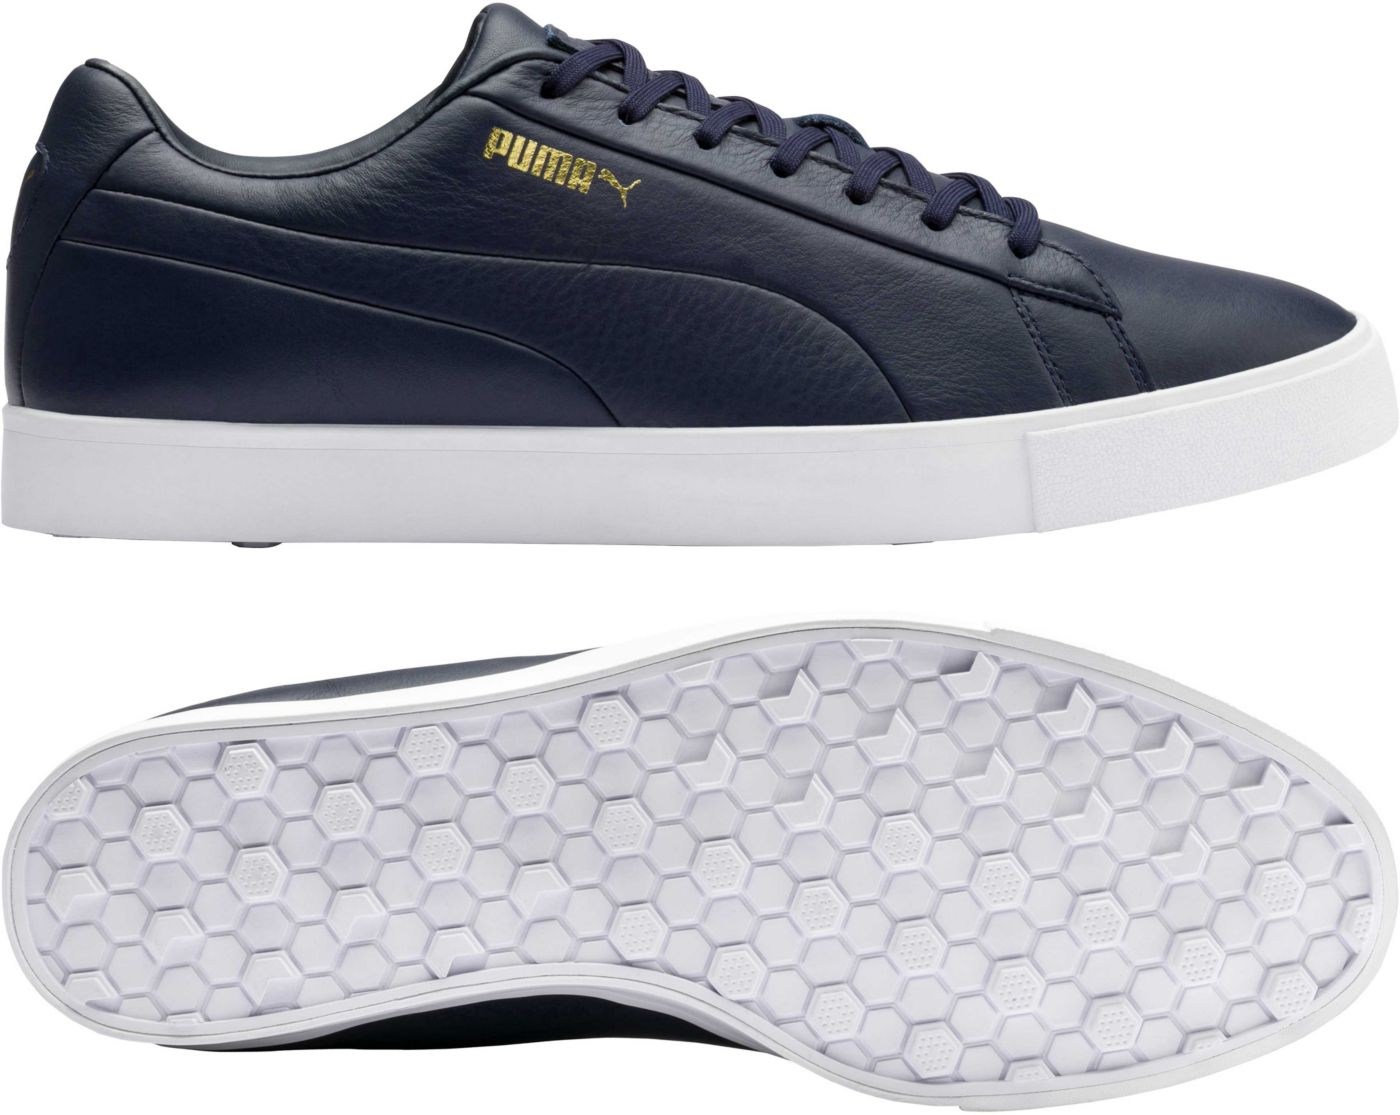 PUMA Men's OG Golf Shoes